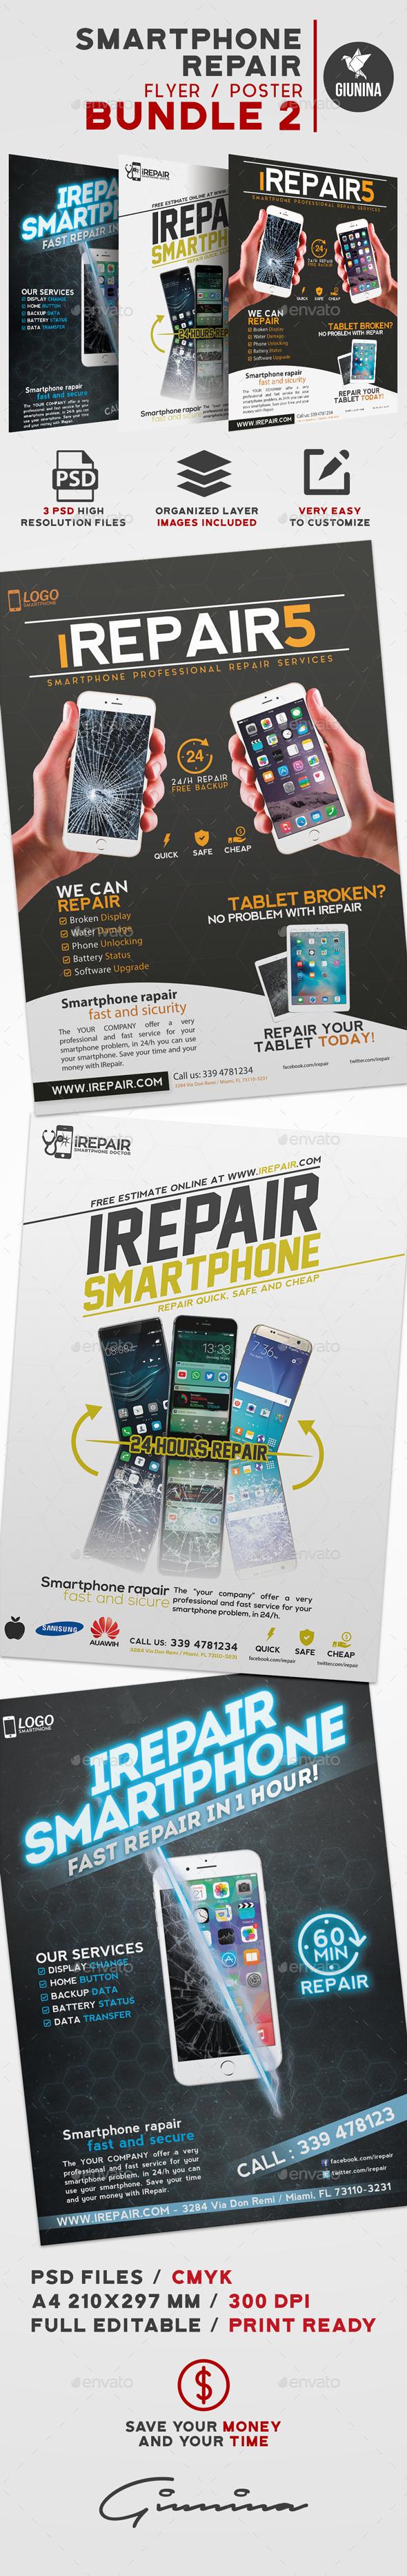 Smartphone Repair Flyer/Poster Bundle 2 - Commerce Flyers